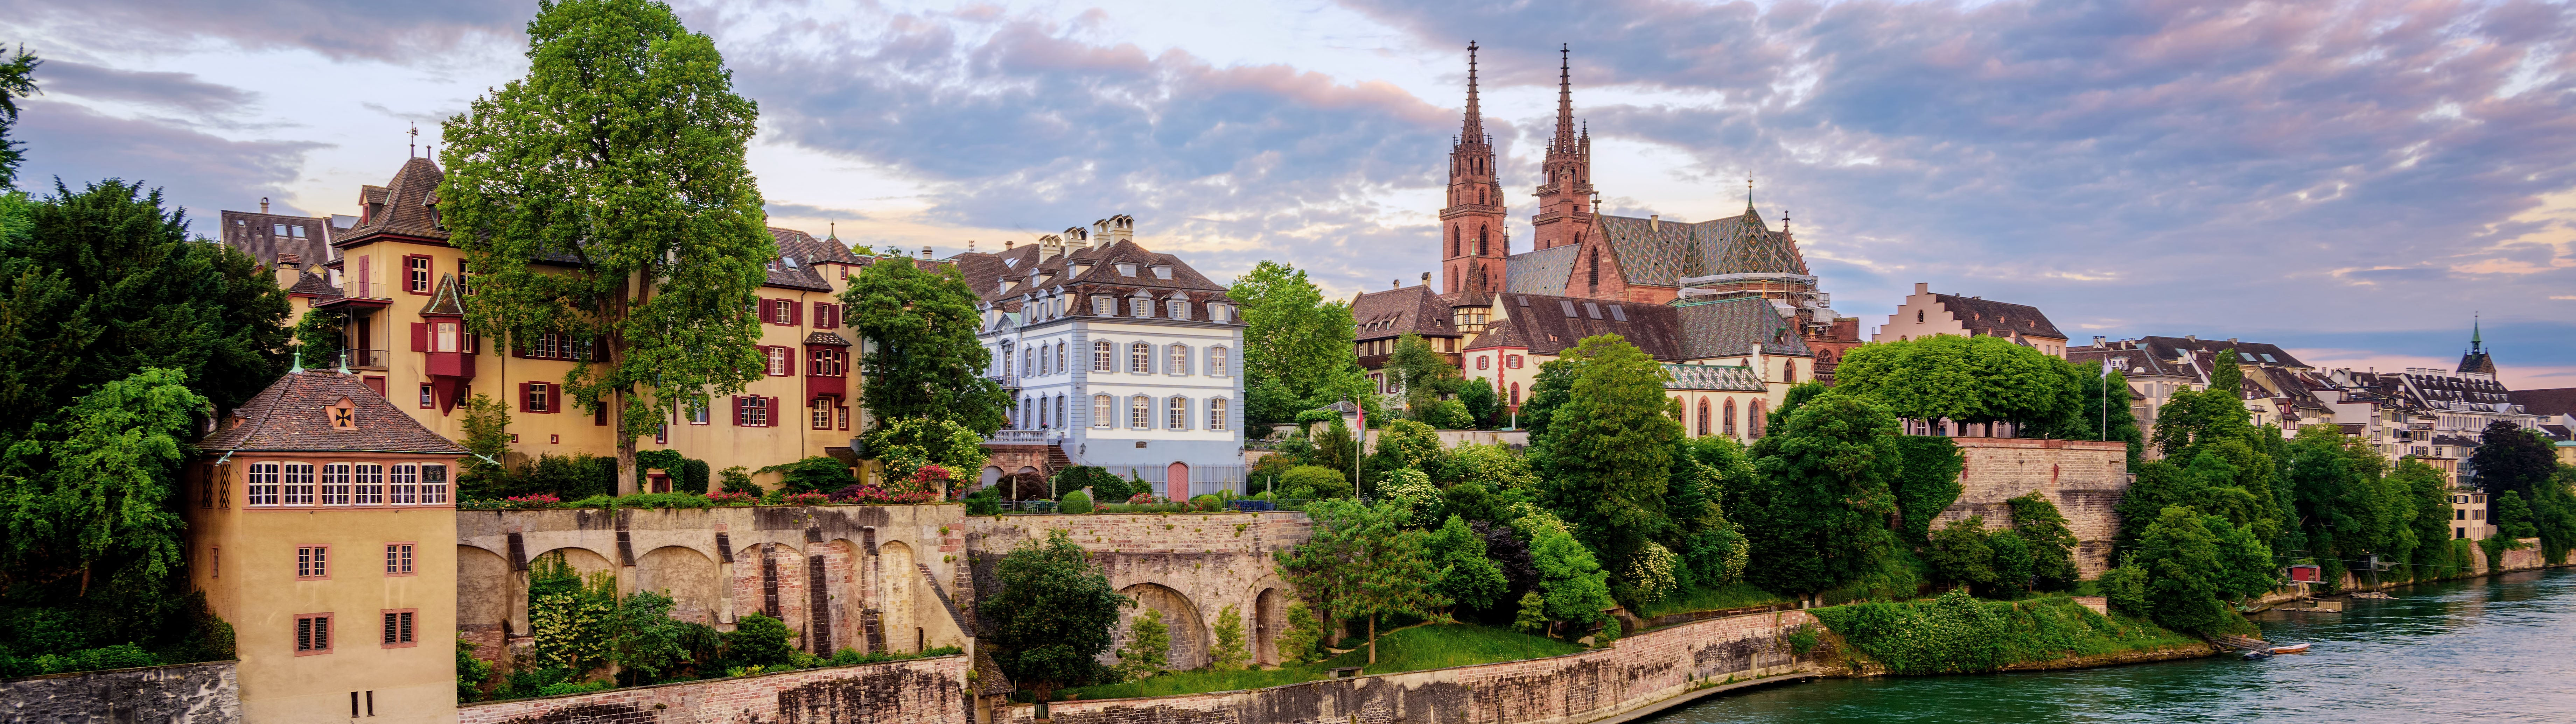 Basel, Altstadt Grossbasel